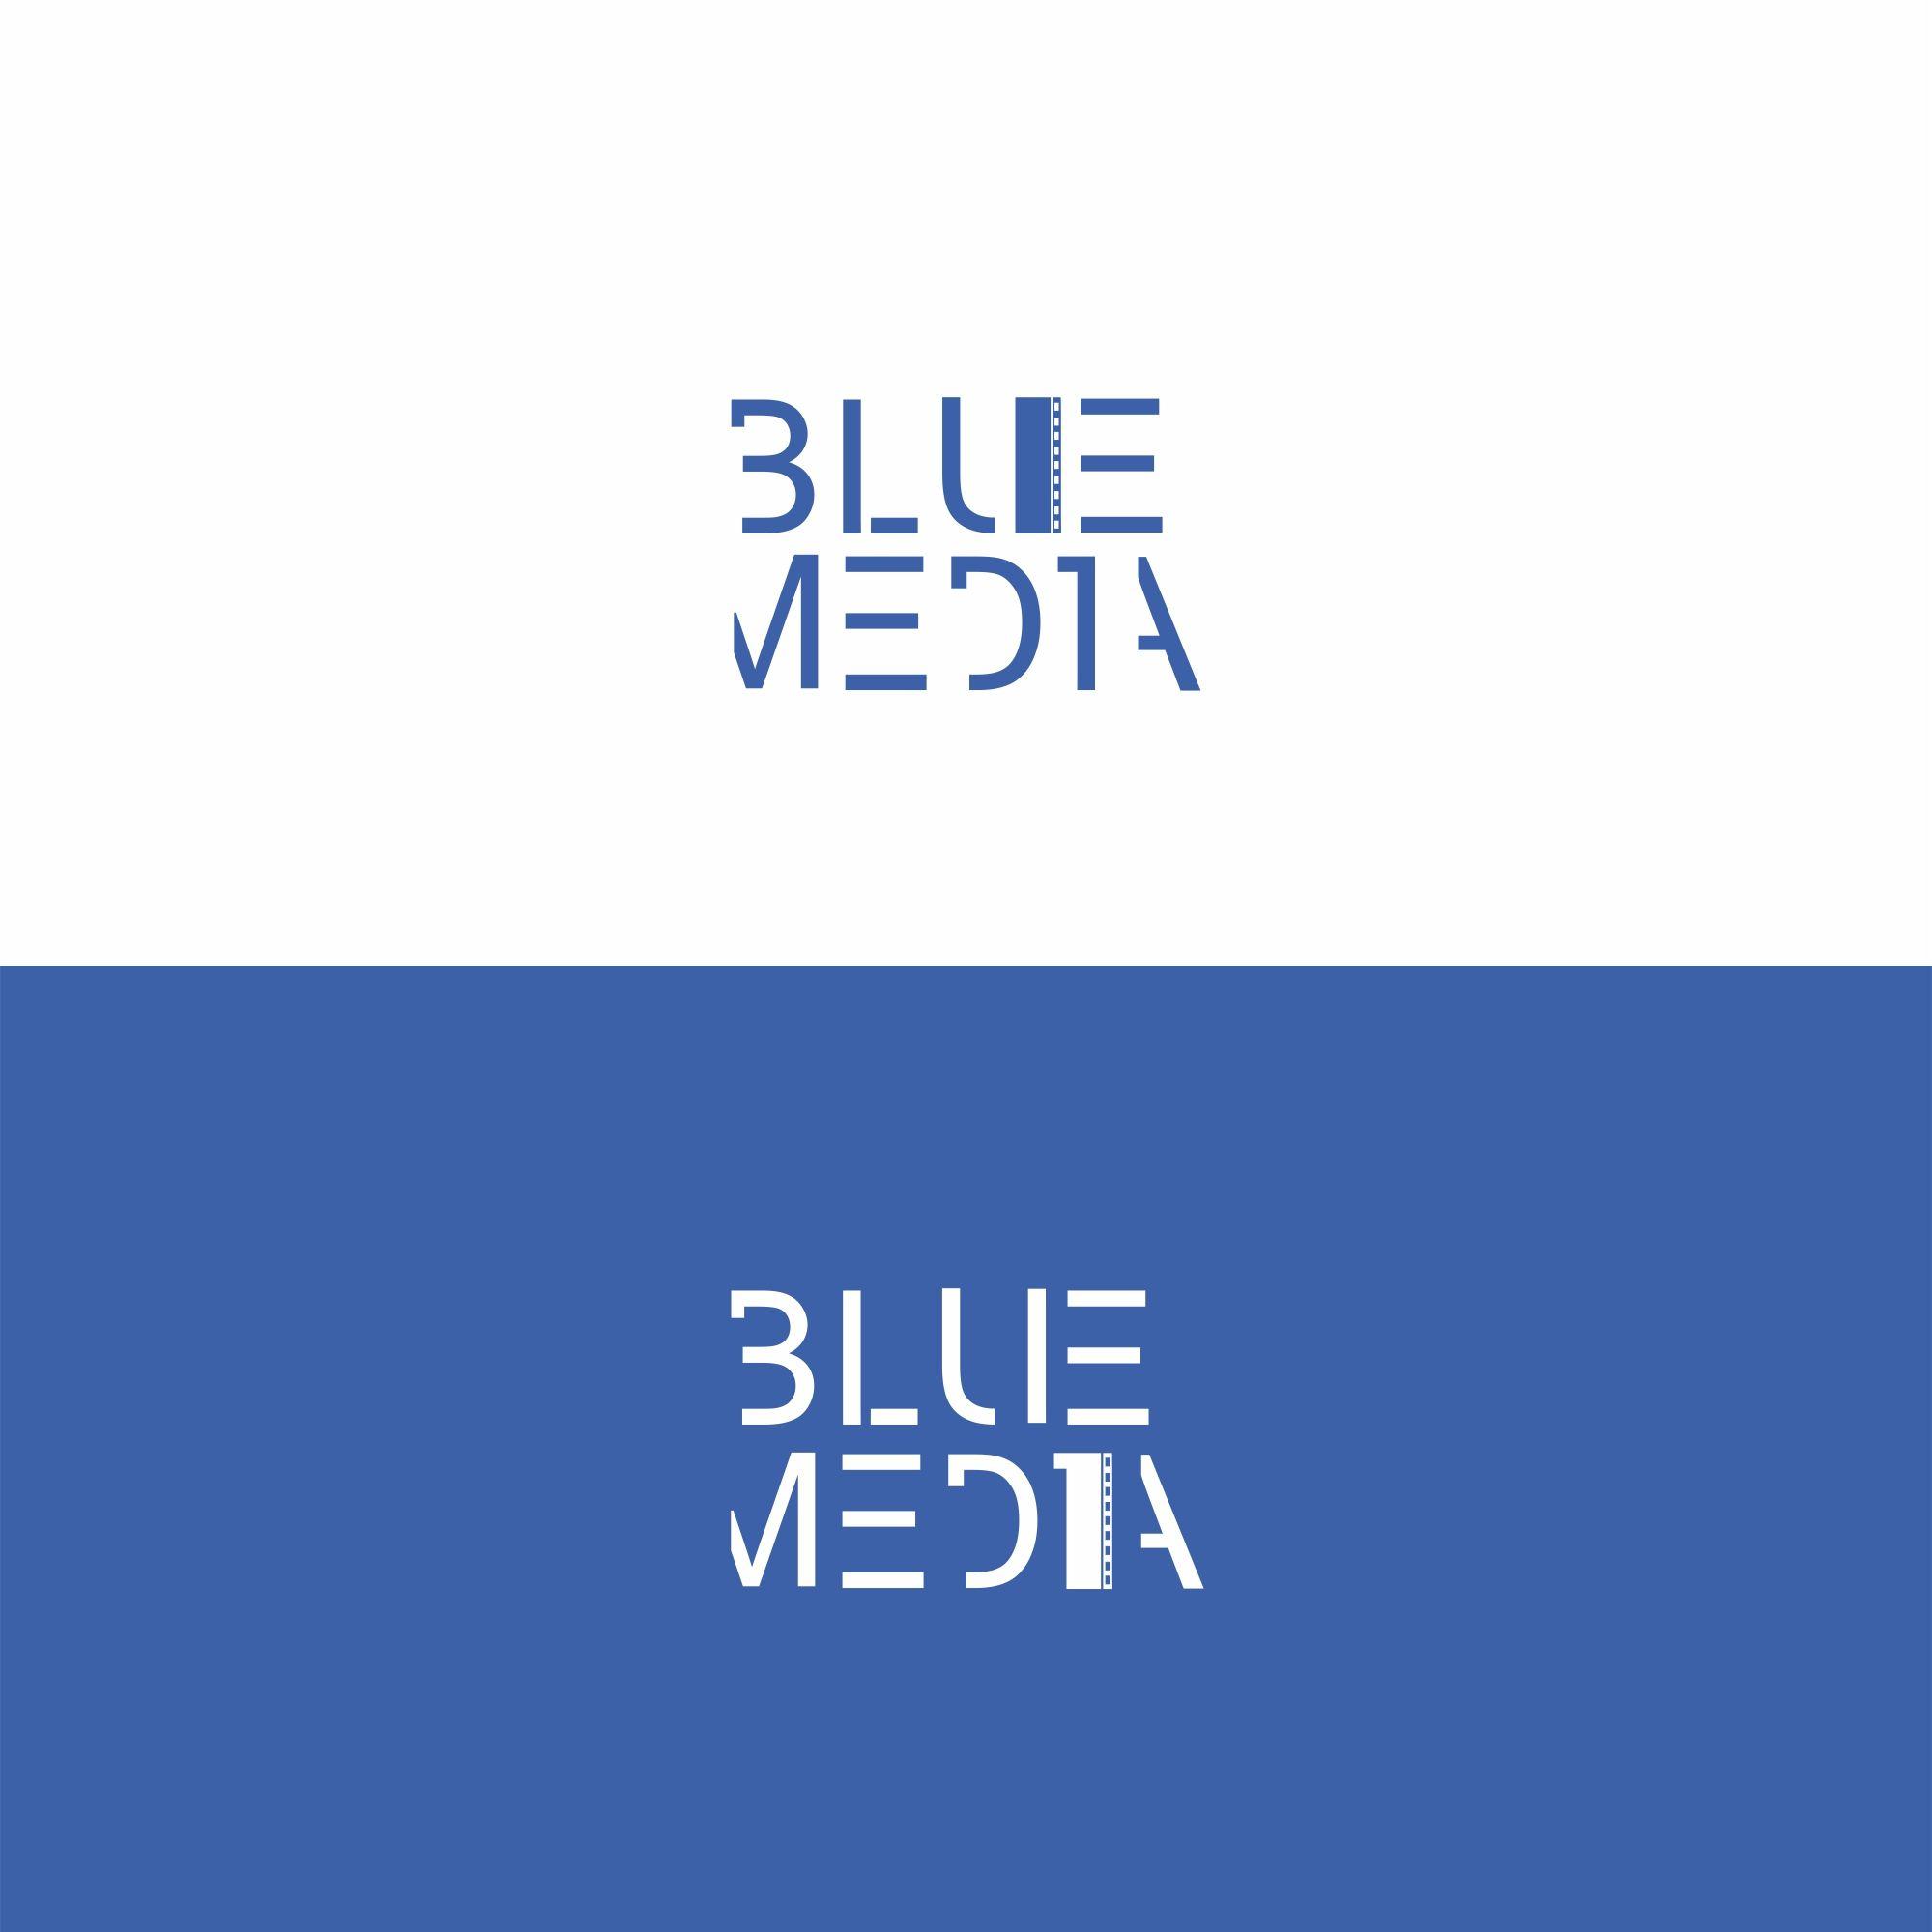 Логотип для видео продакшн - дизайнер LooseBaloon